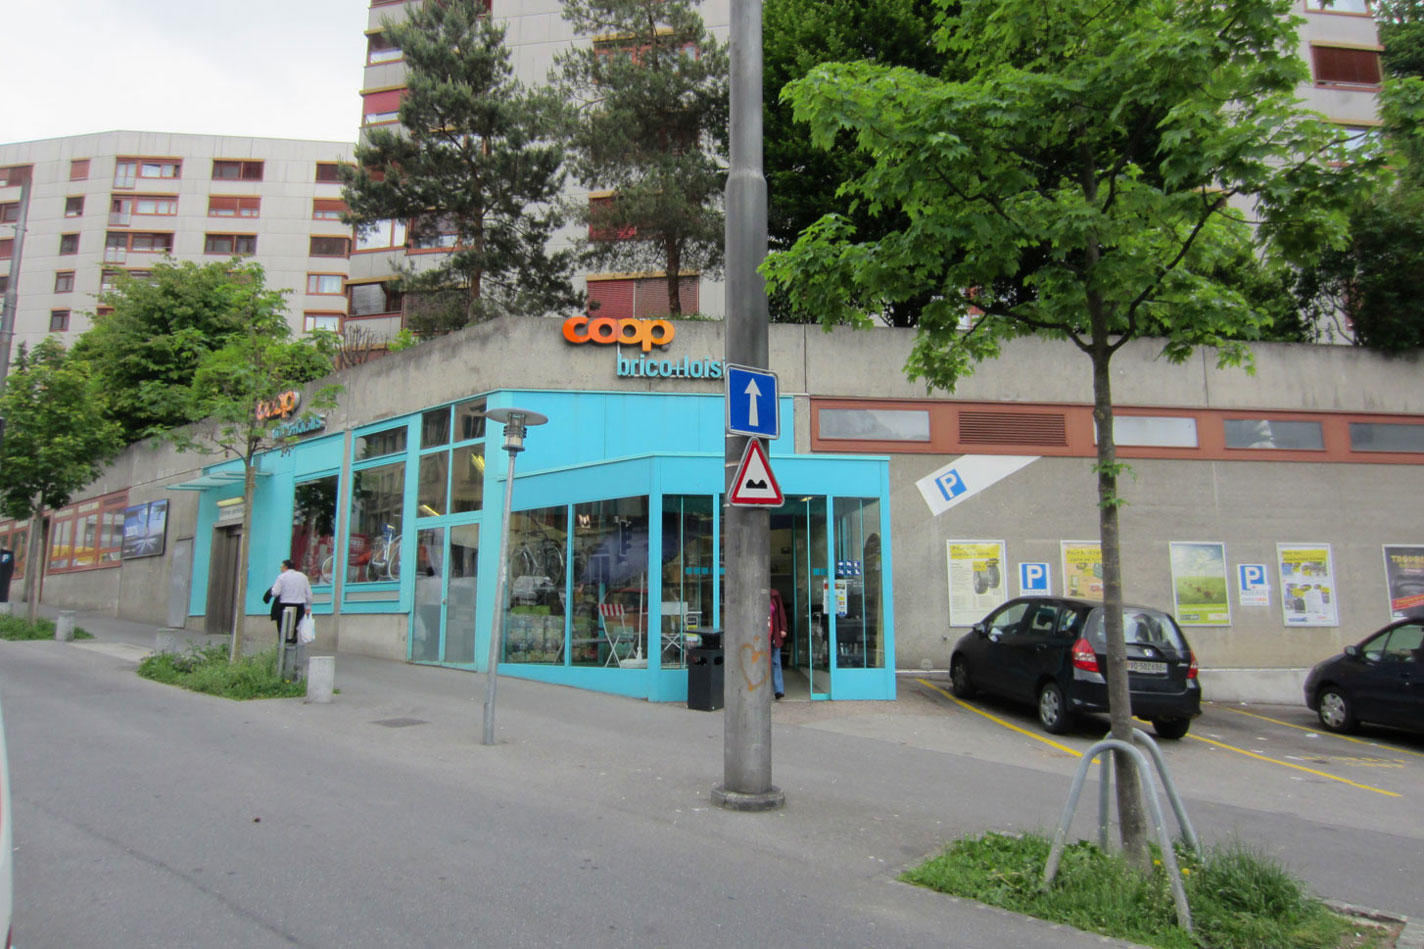 Coop Brico+Loisirs Lausanne Borde